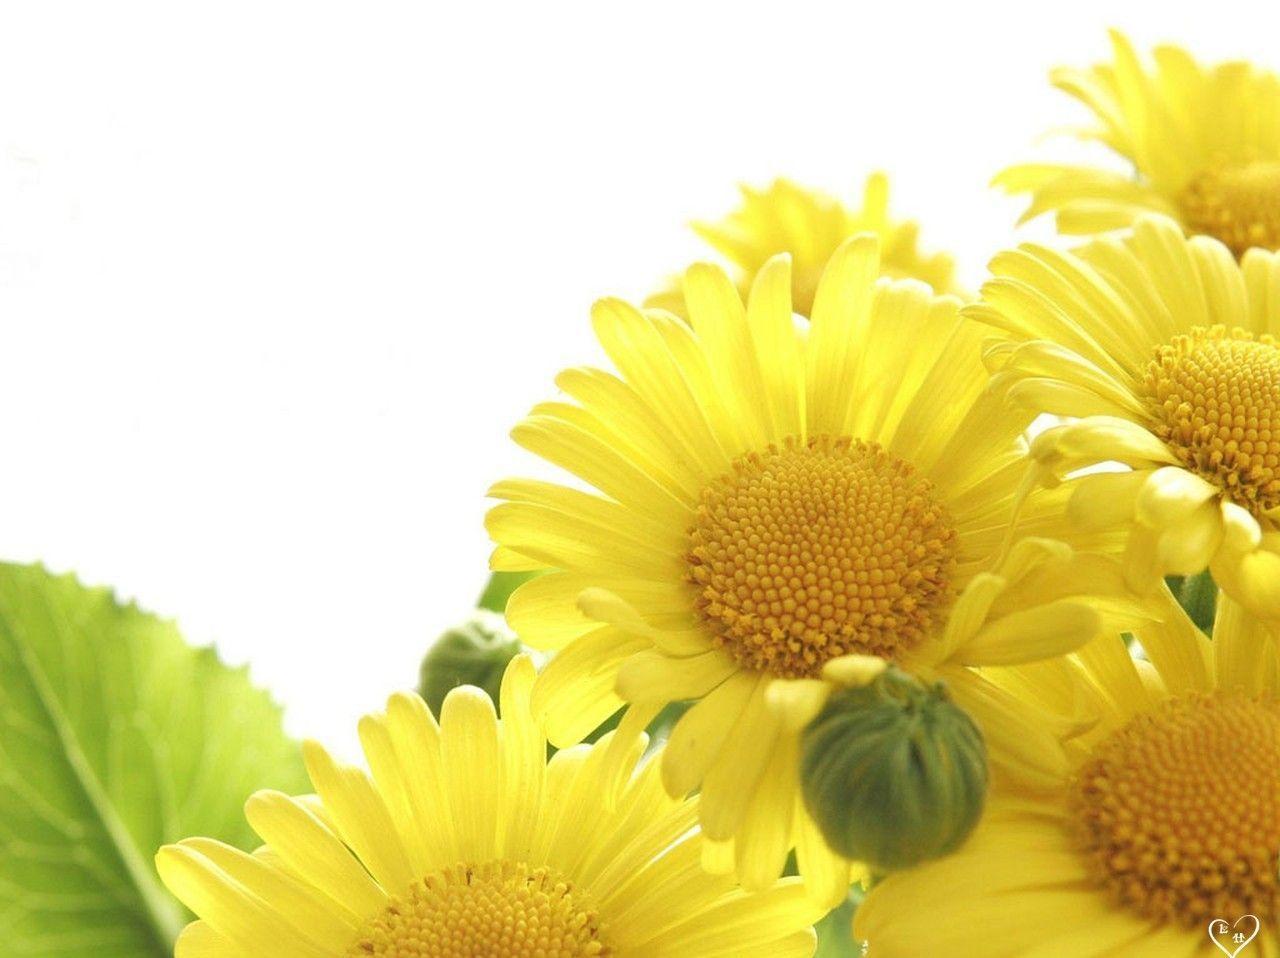 sunflower nature image